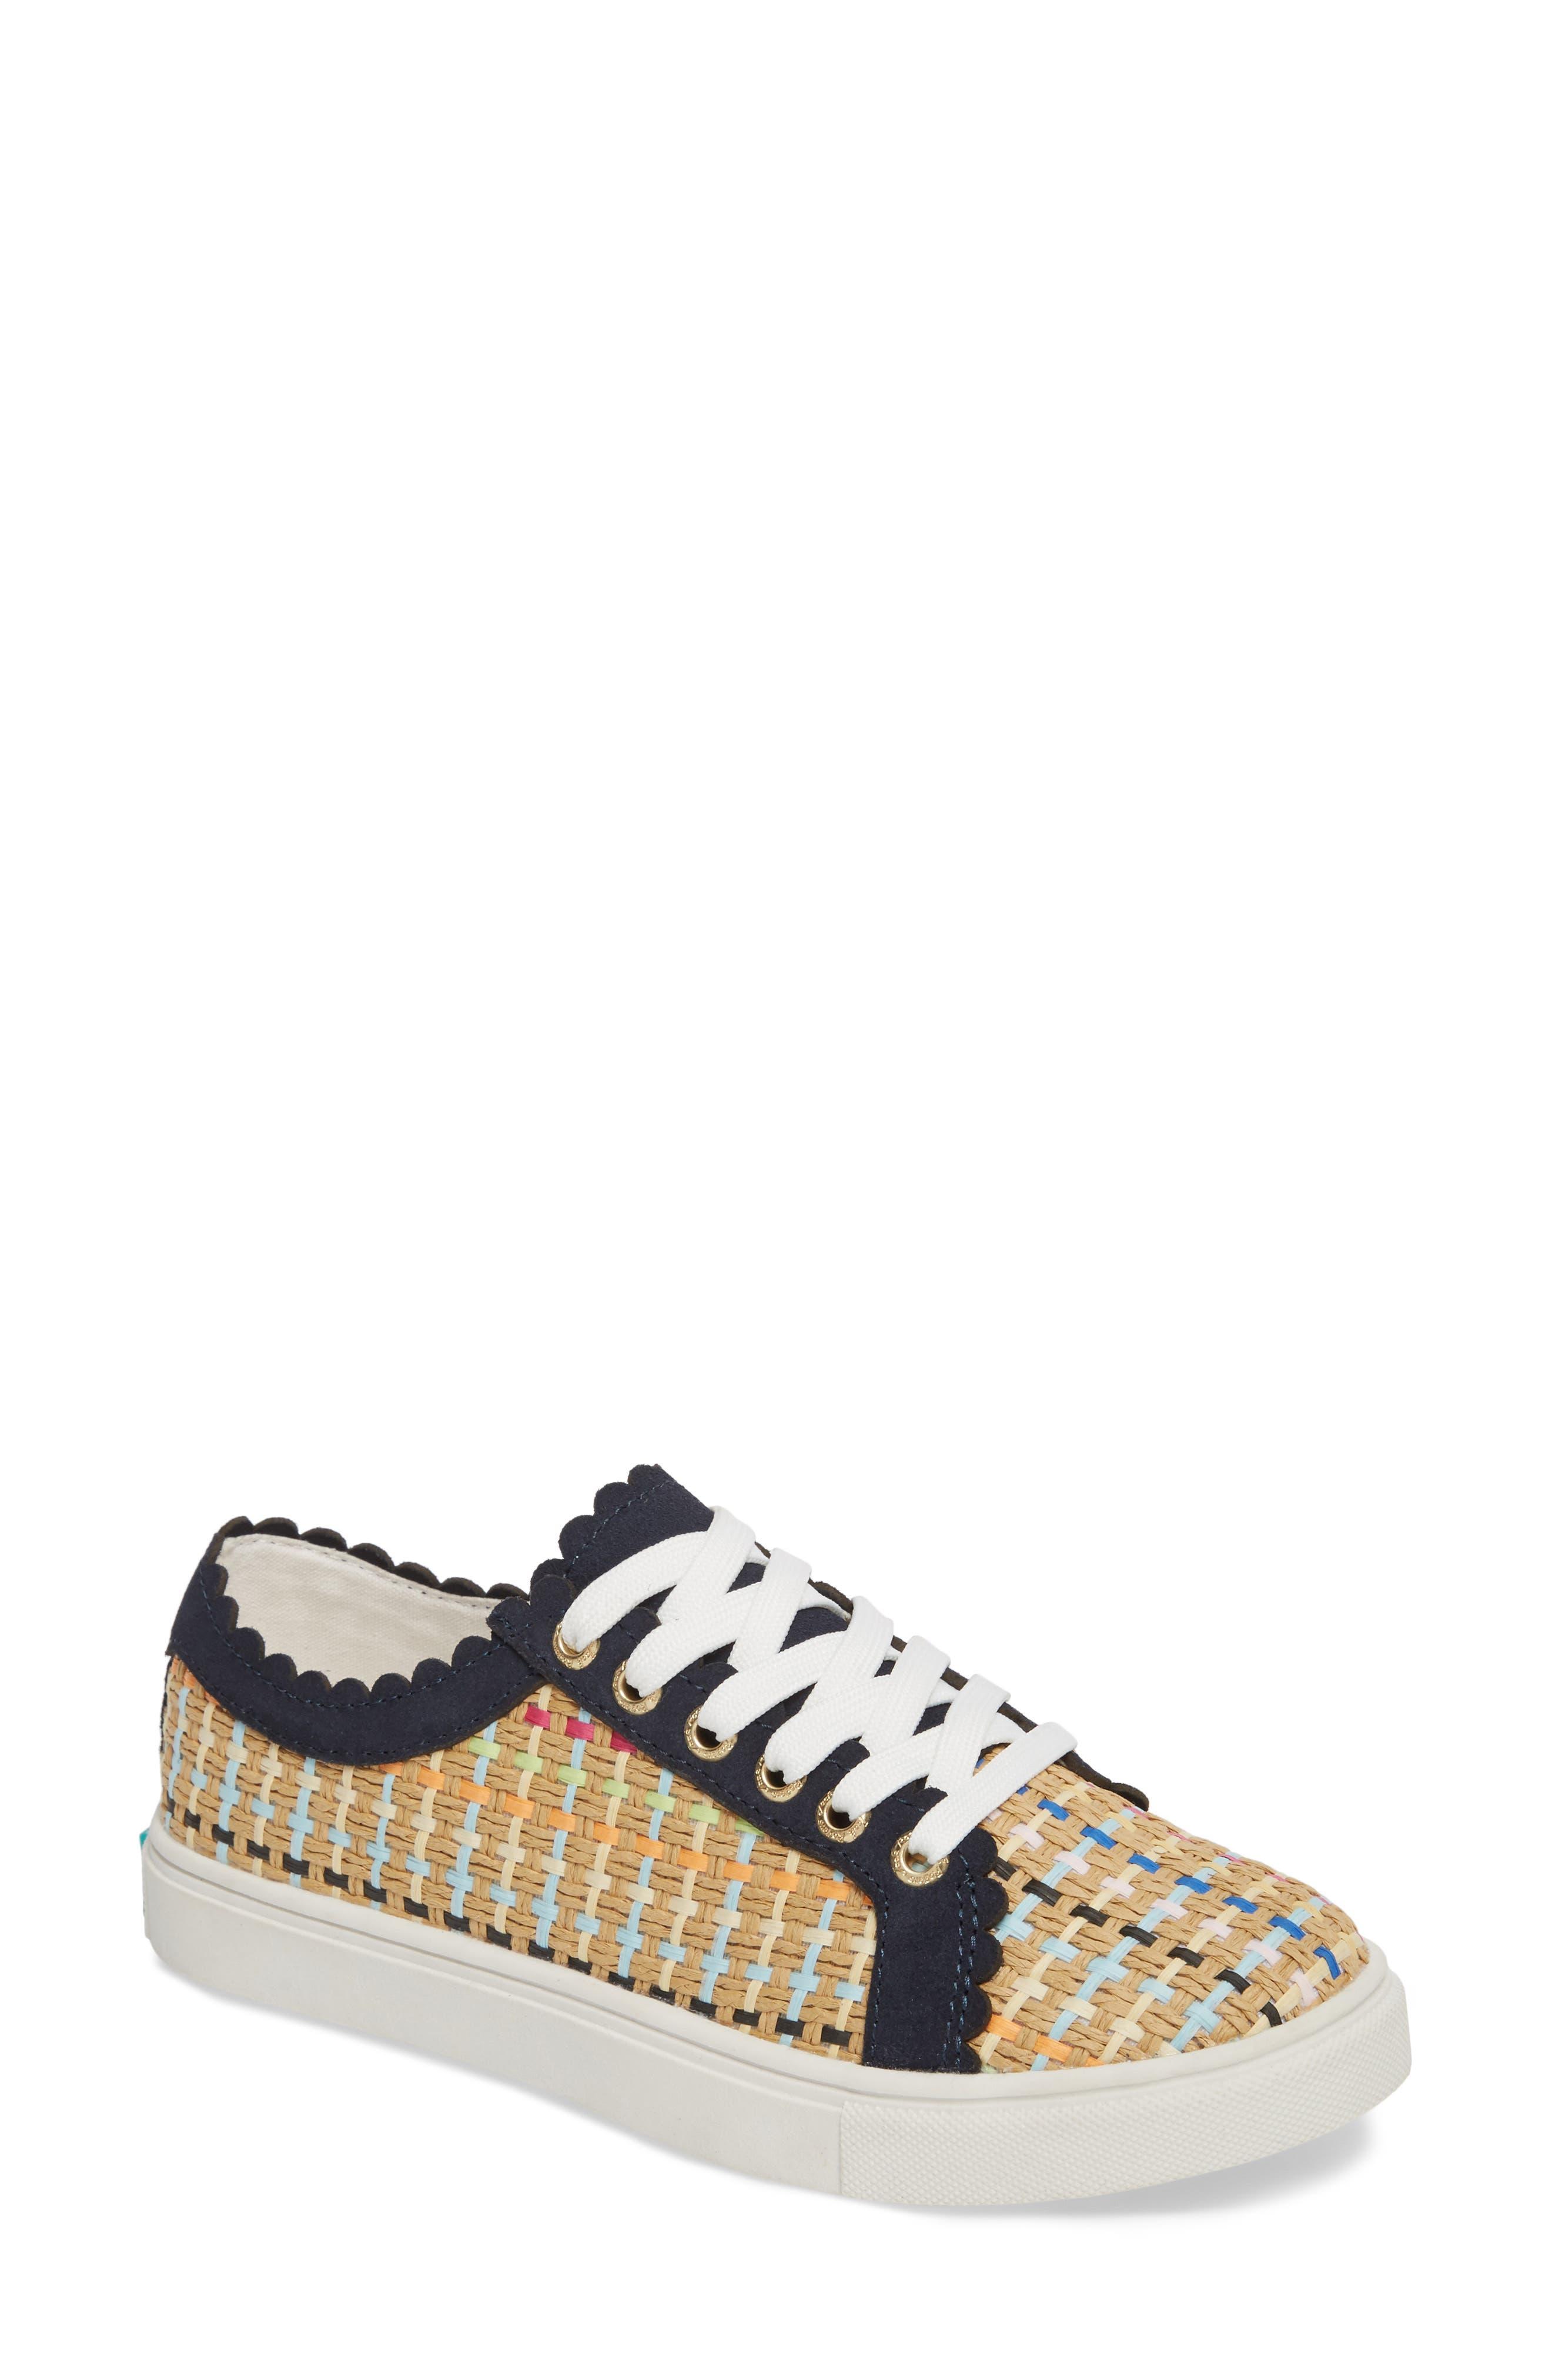 Teagan Sneaker,                             Main thumbnail 1, color,                             Multi Combo